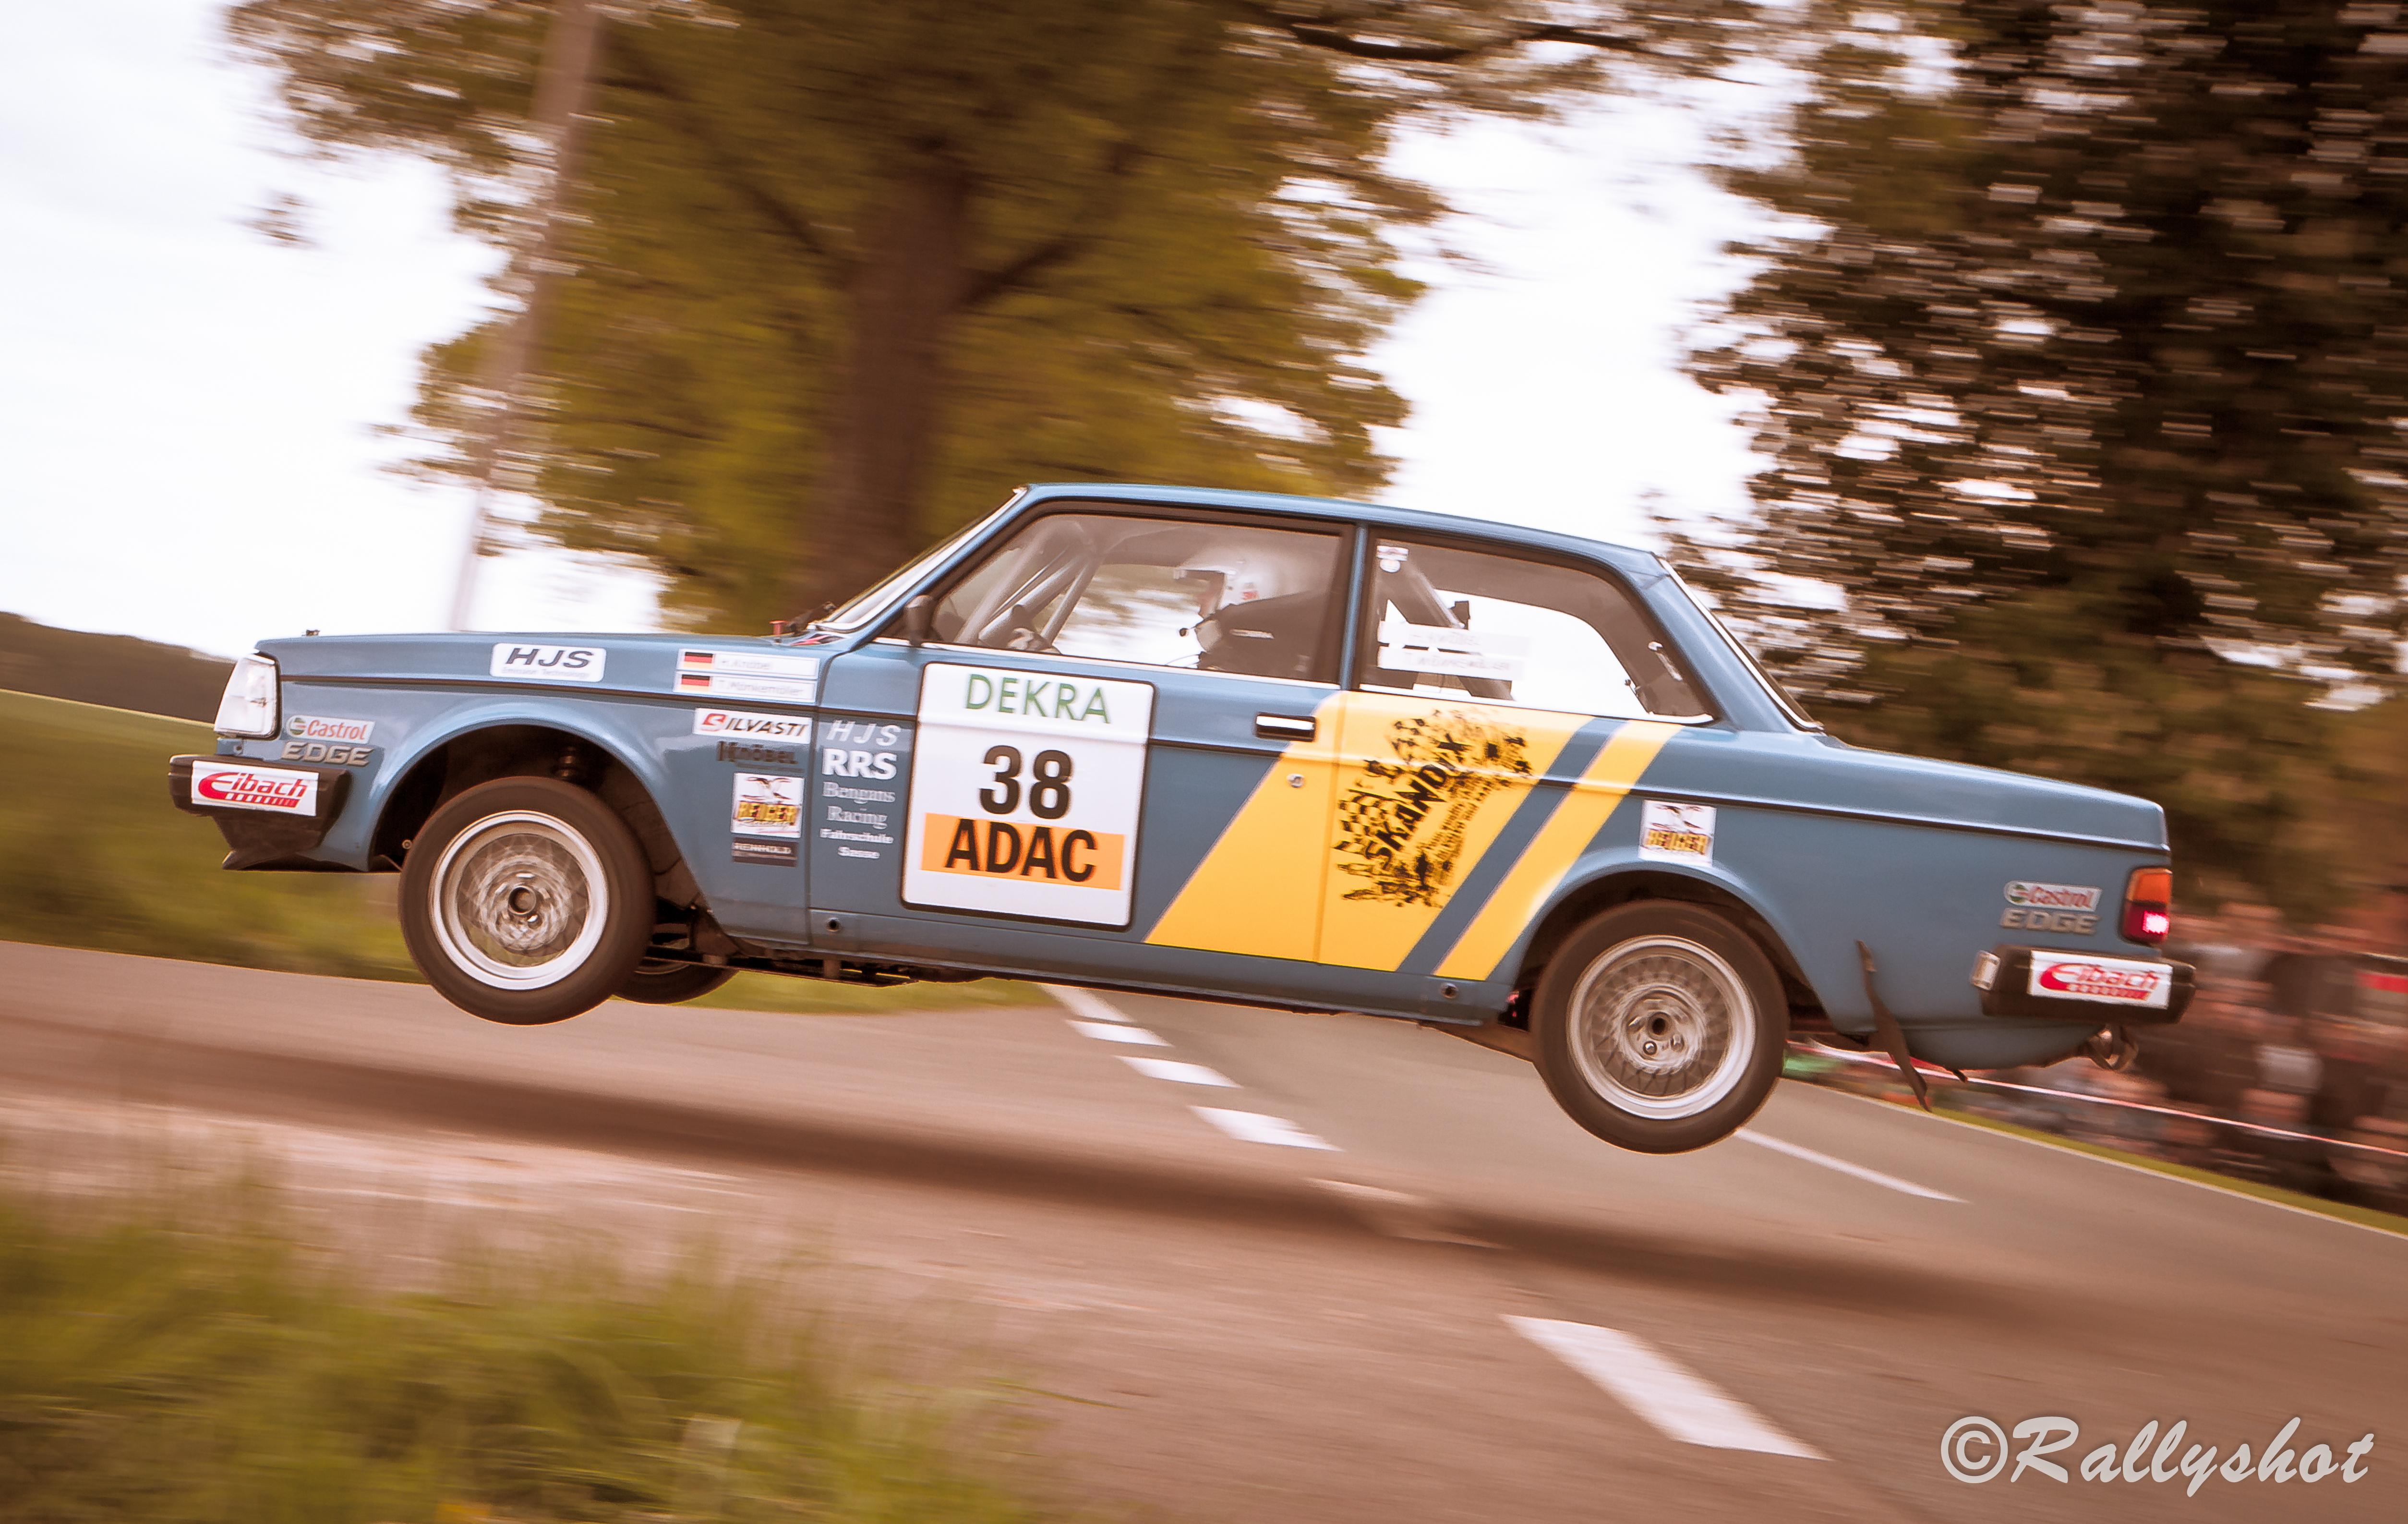 Auto Car Sport Canon Germany Volvo High Jump Rally Fast 7d Vehicle Drm  Rallye Motorsport 2014